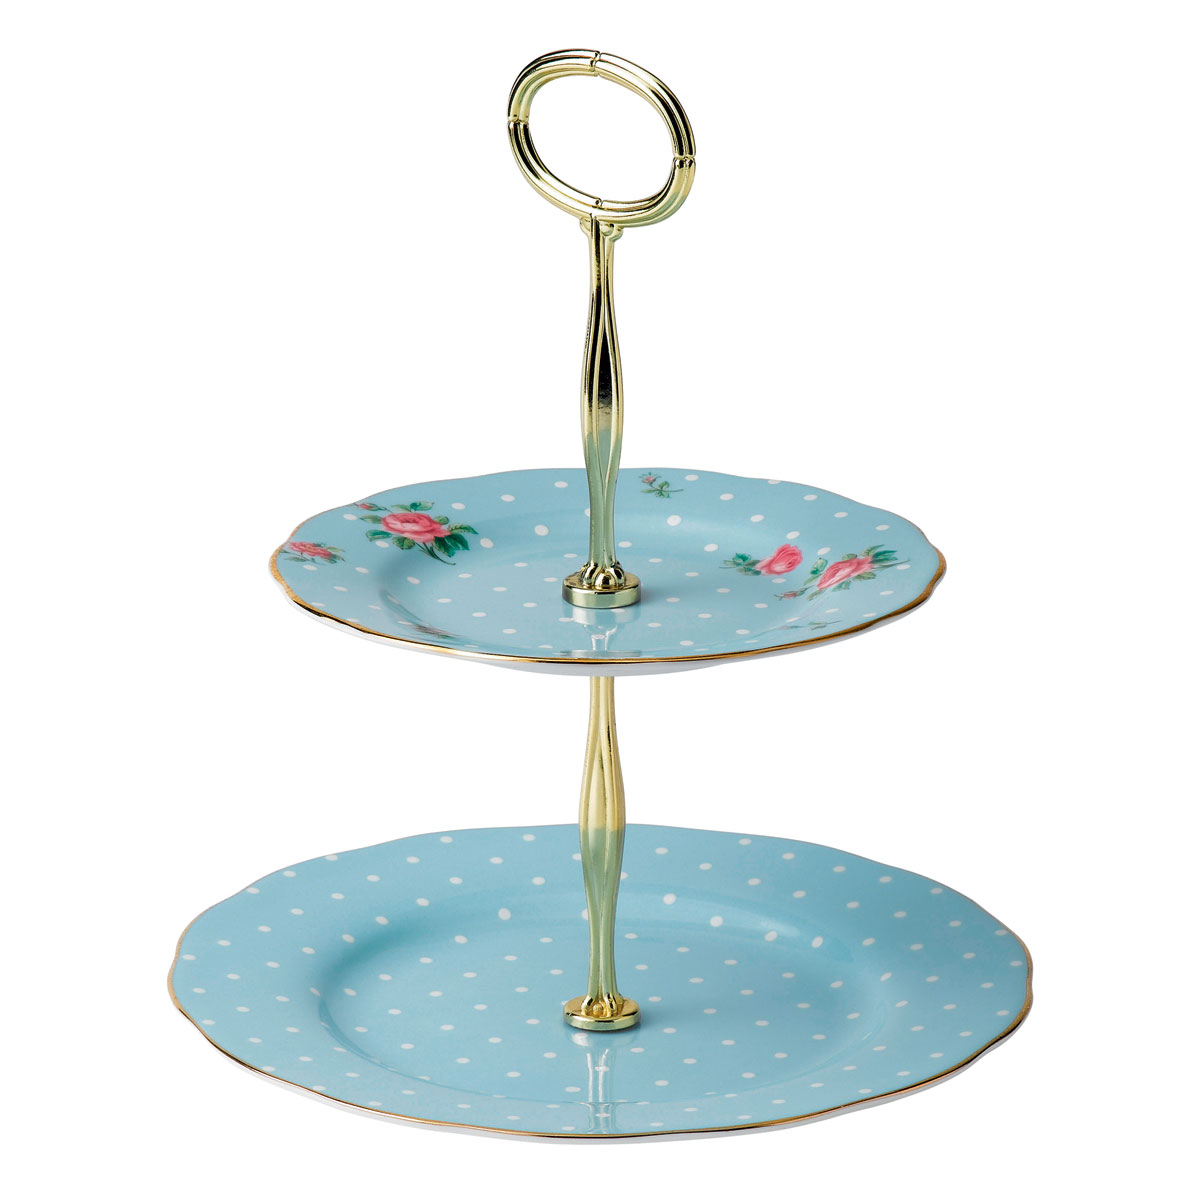 Royal Albert Polka Blue Cake Stand Two-Tier